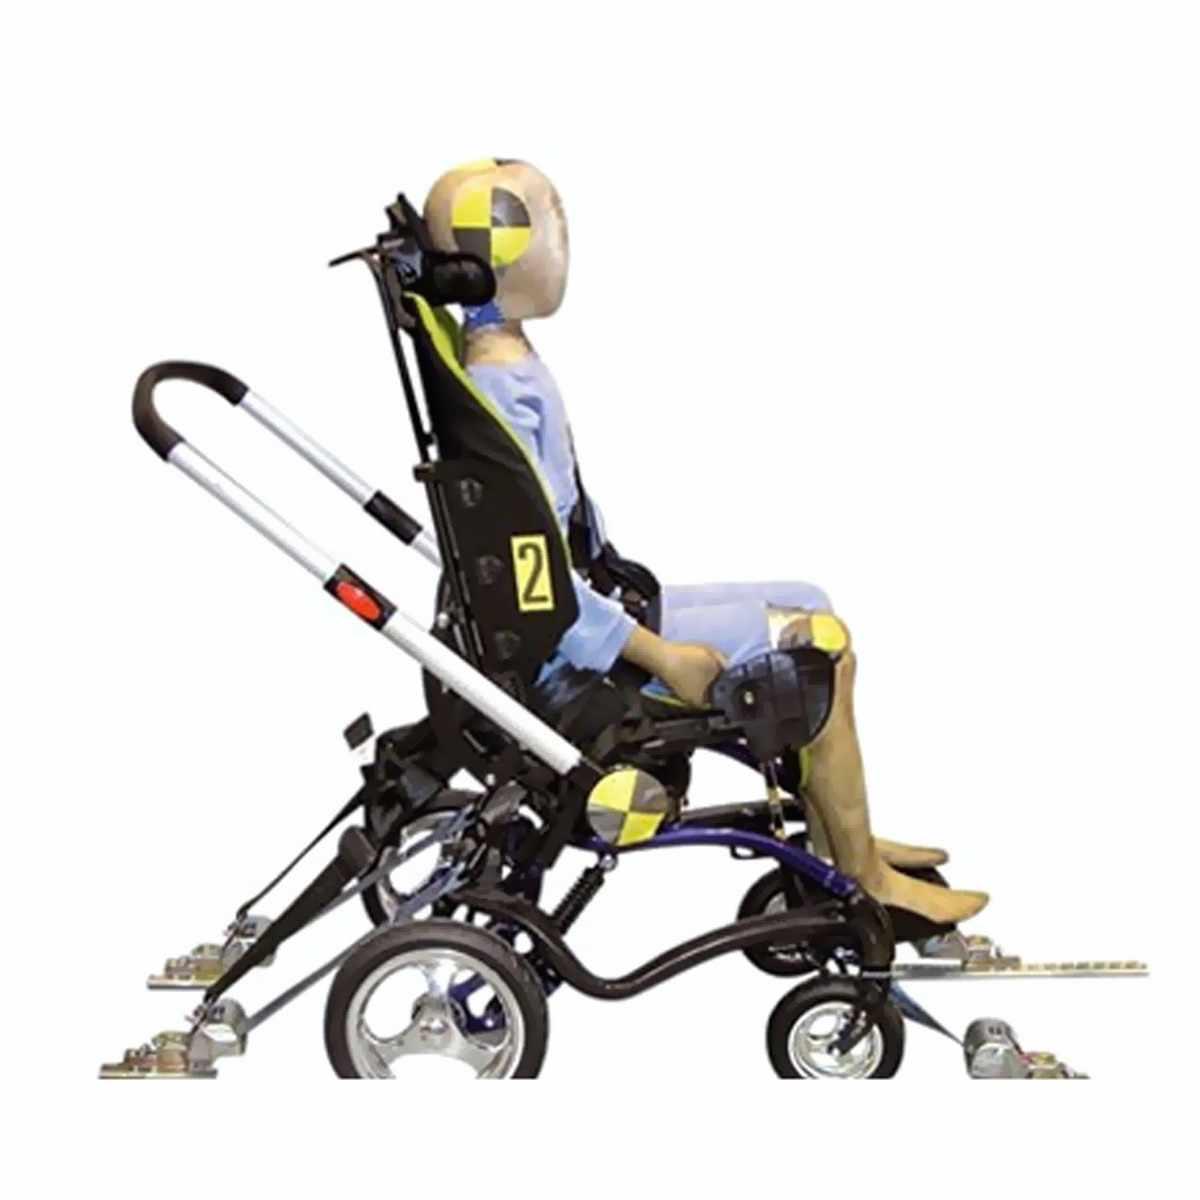 Stingray stroller